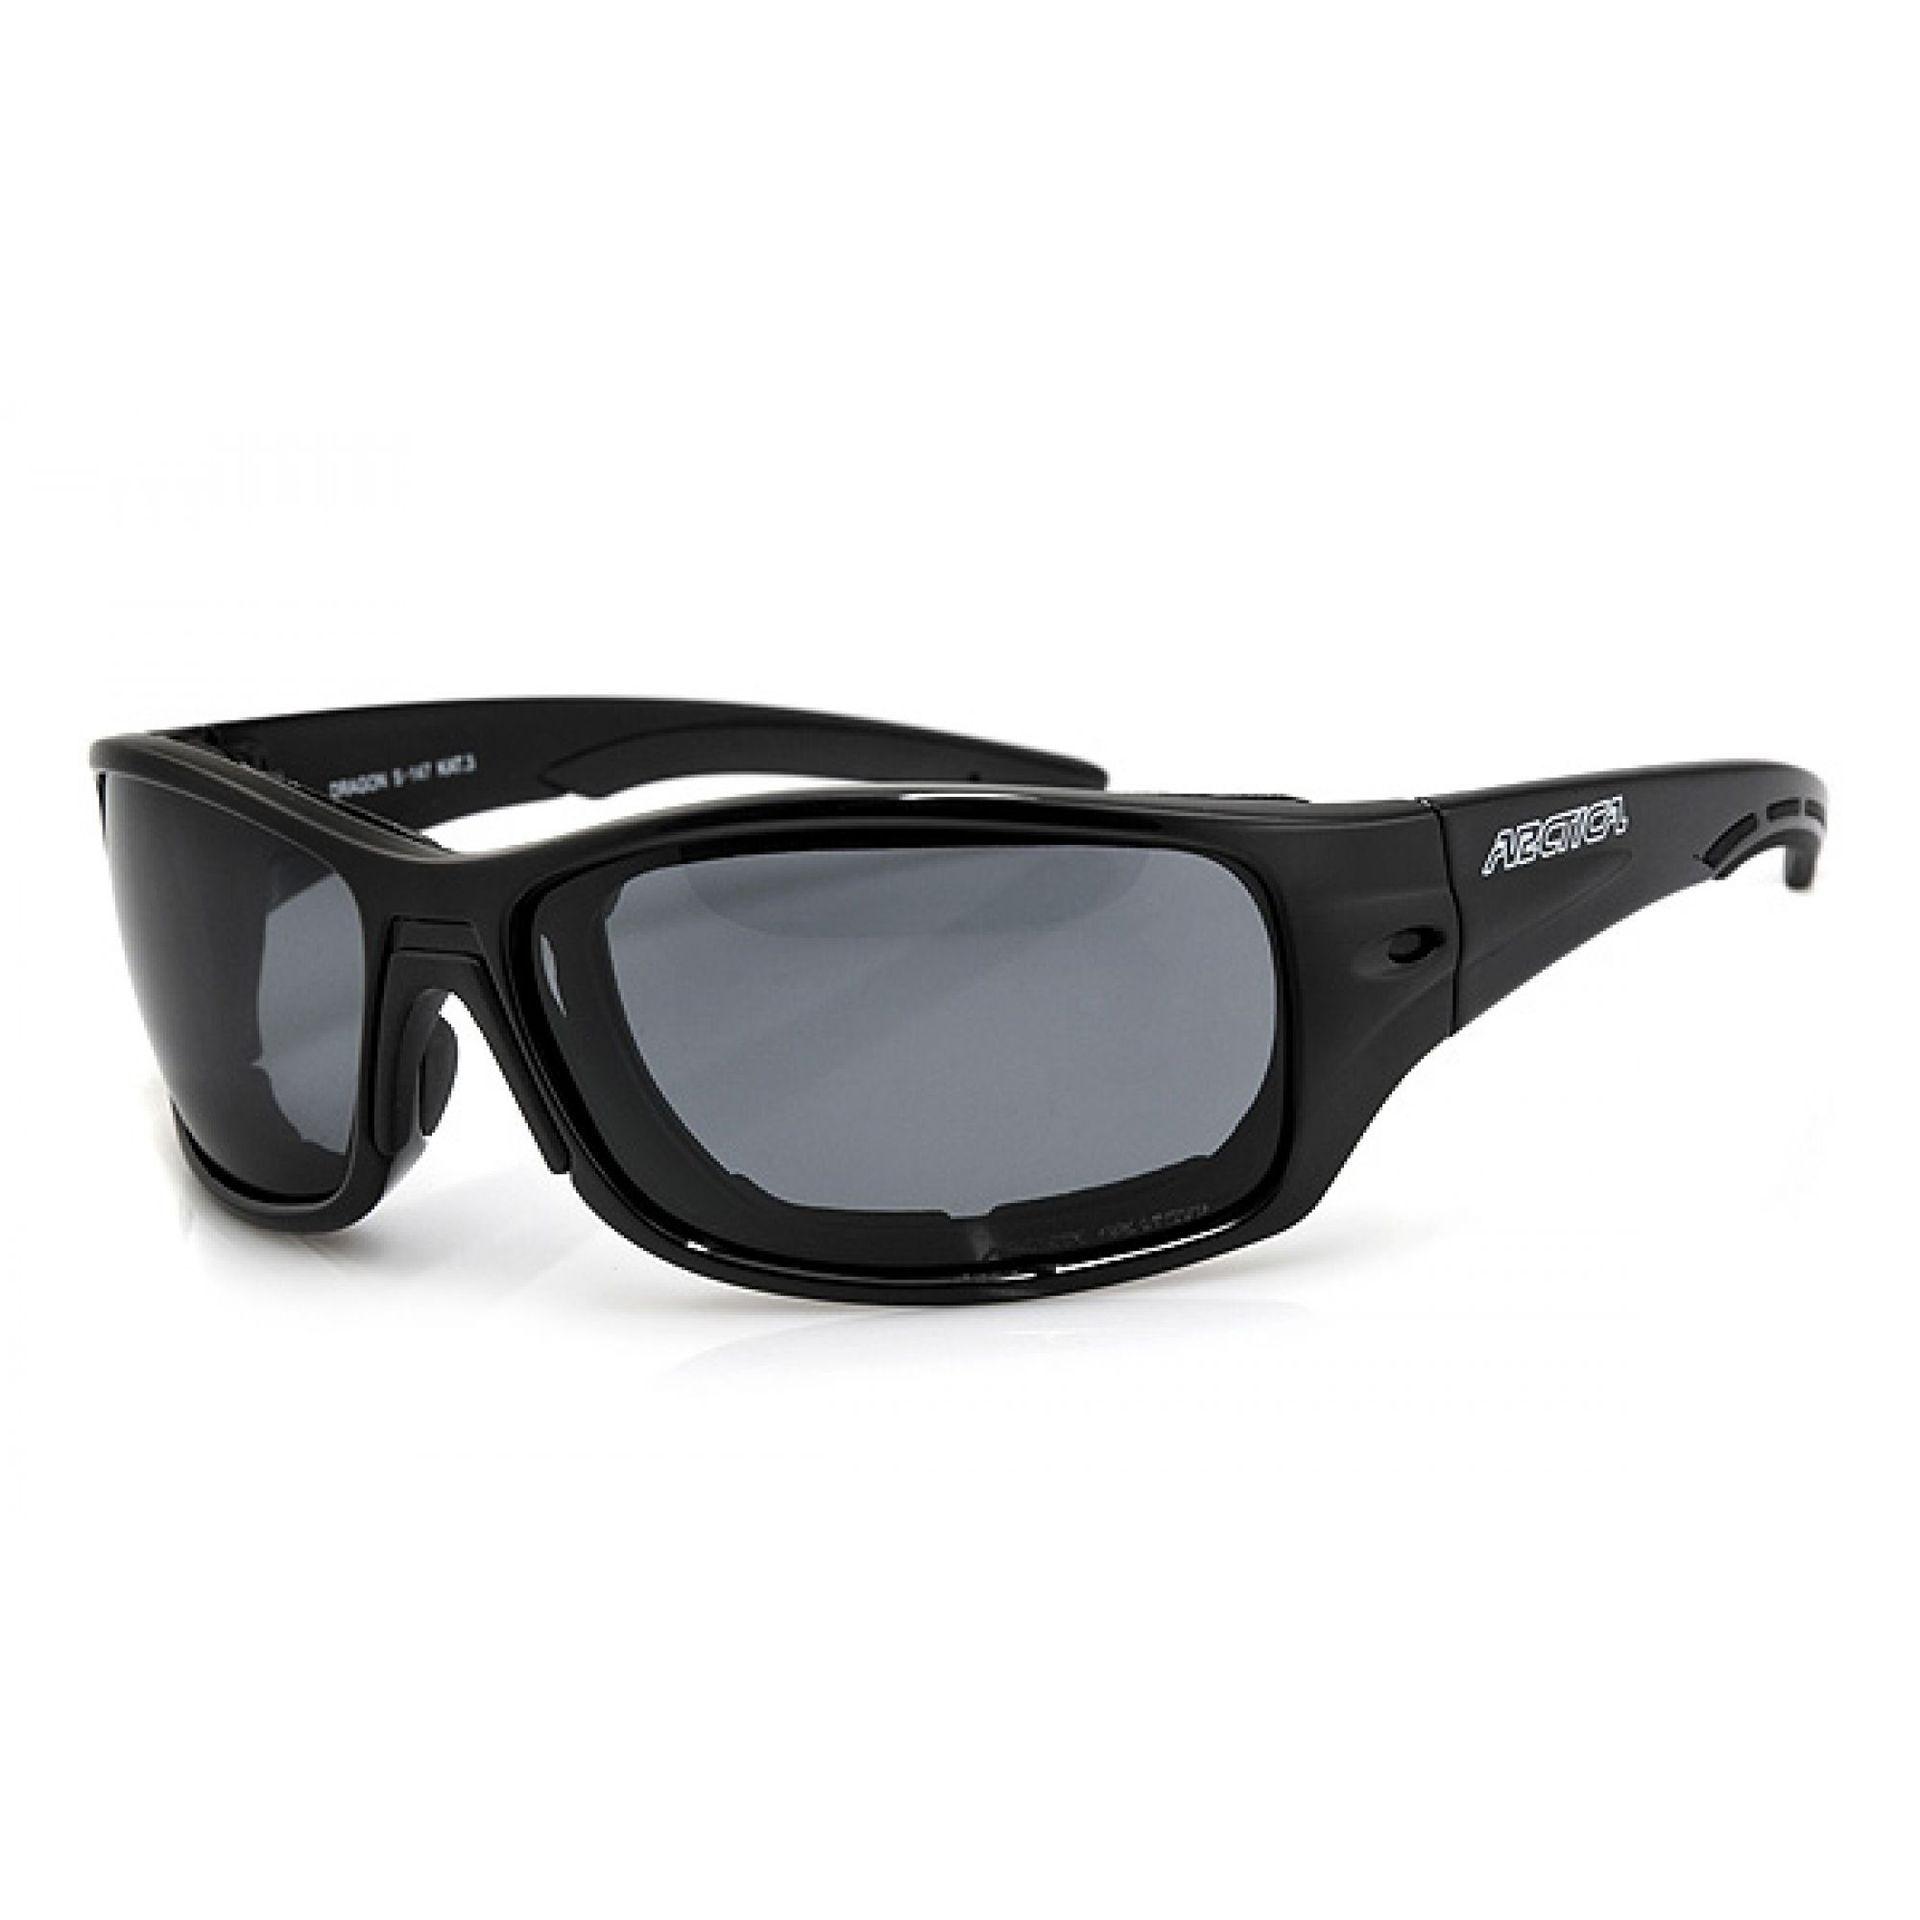 Okulary Arctica S-147 czarne